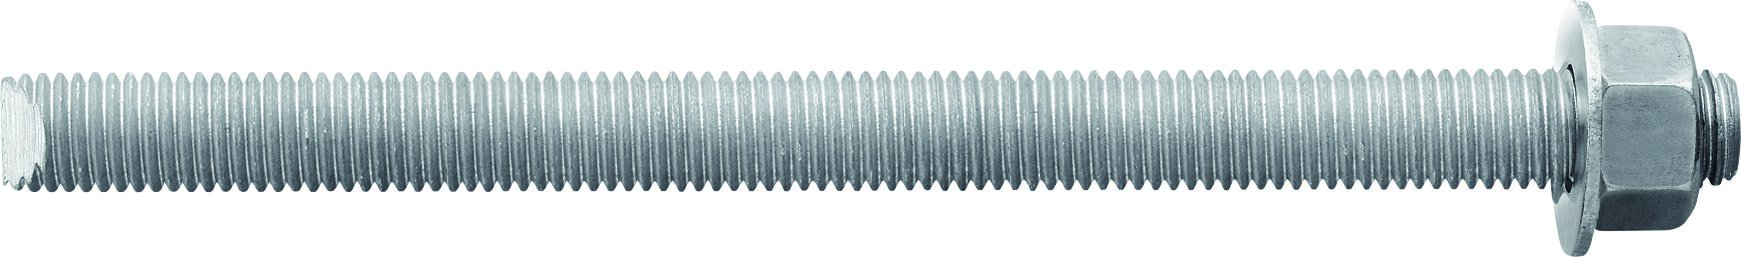 Hilti 3554858Anchor rod HAS-E-B 5/8x8 MC/80